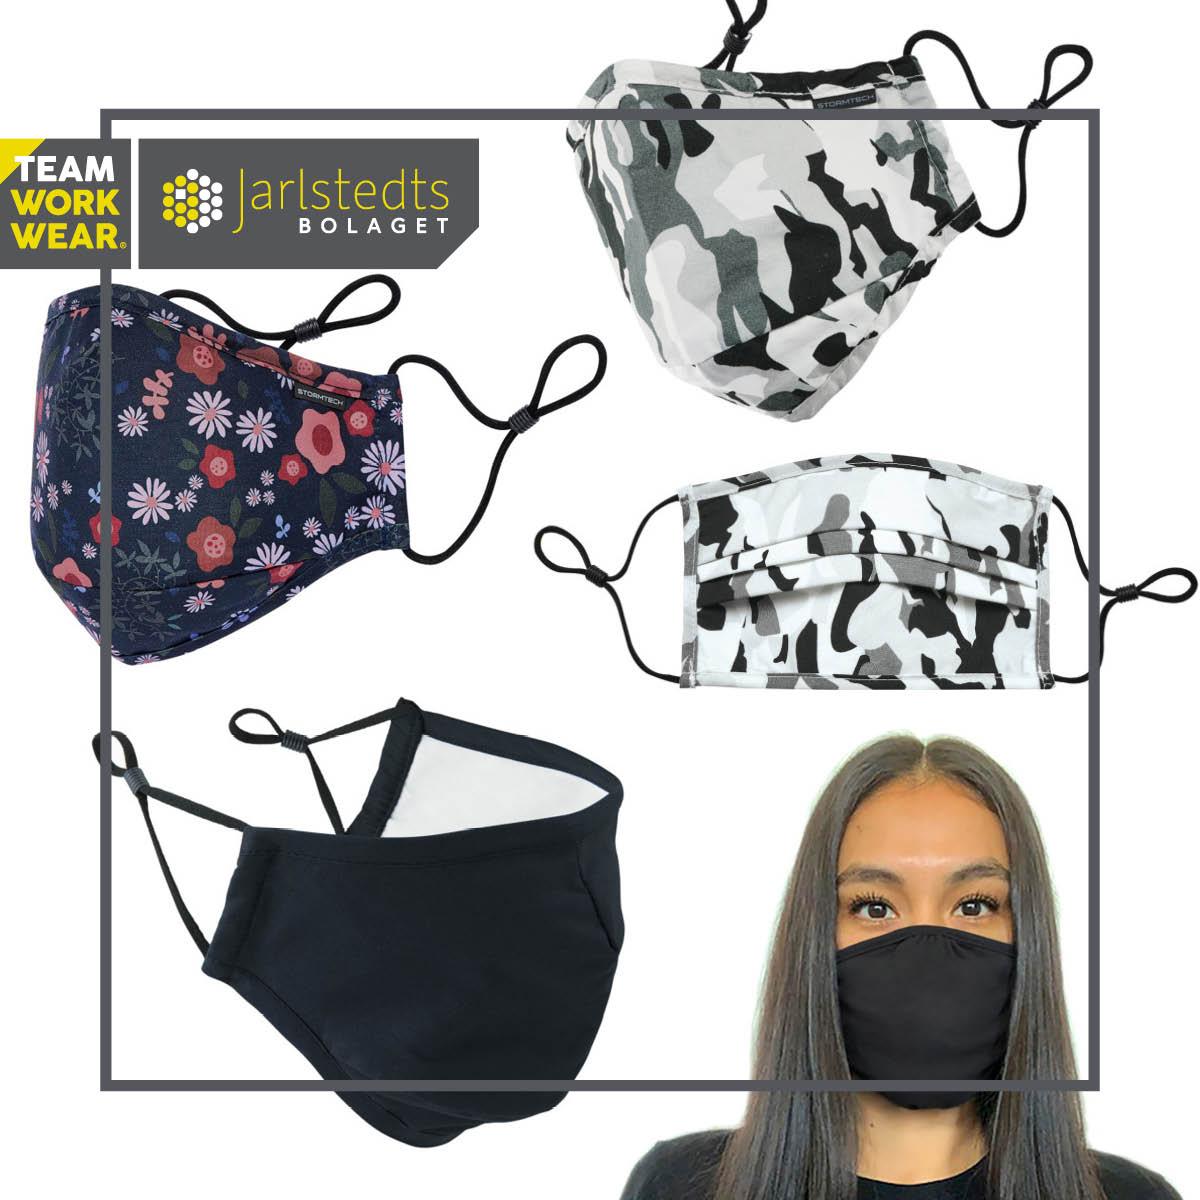 Commuter mask